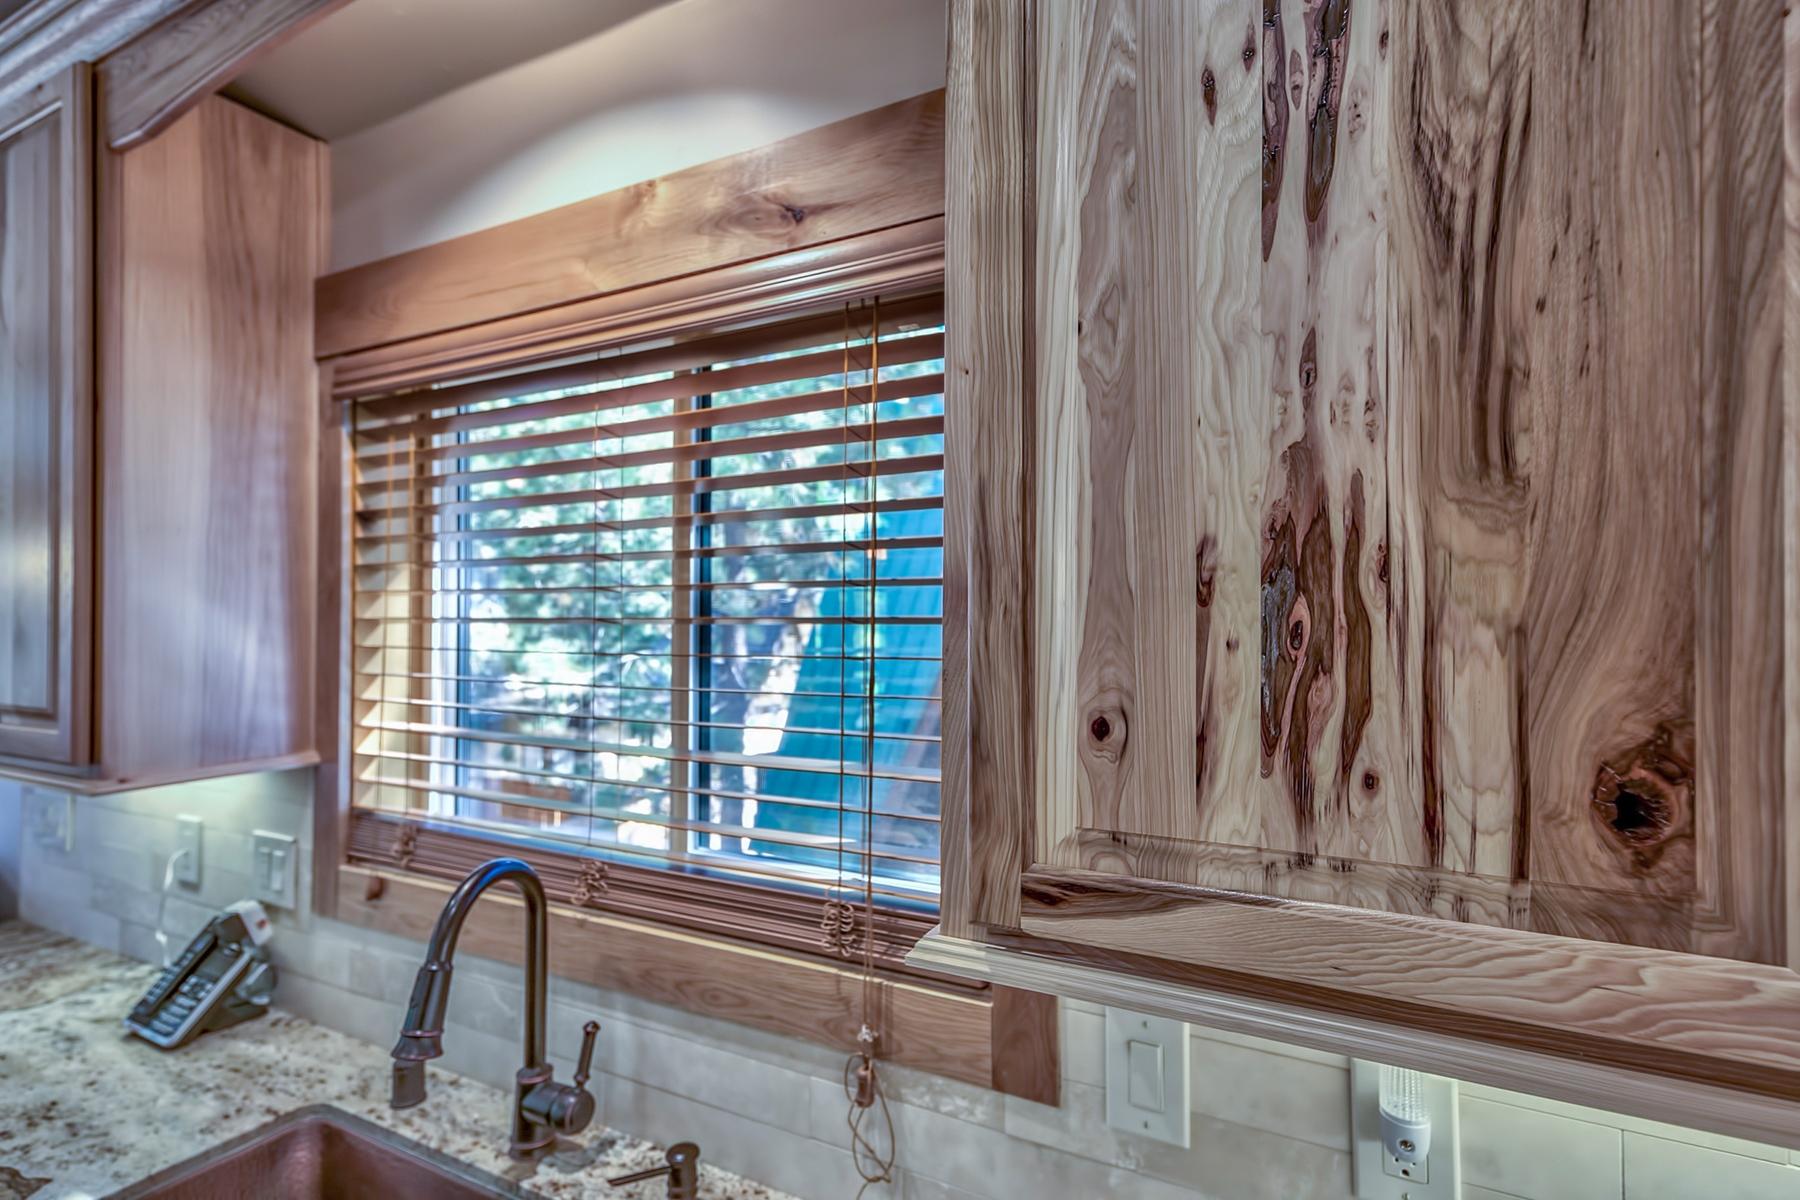 Additional photo for property listing at 917 Creekwood Drive, South Lake Tahoe, CA 96150 917 Creekwood Drive South Lake Tahoe, California 96150 United States